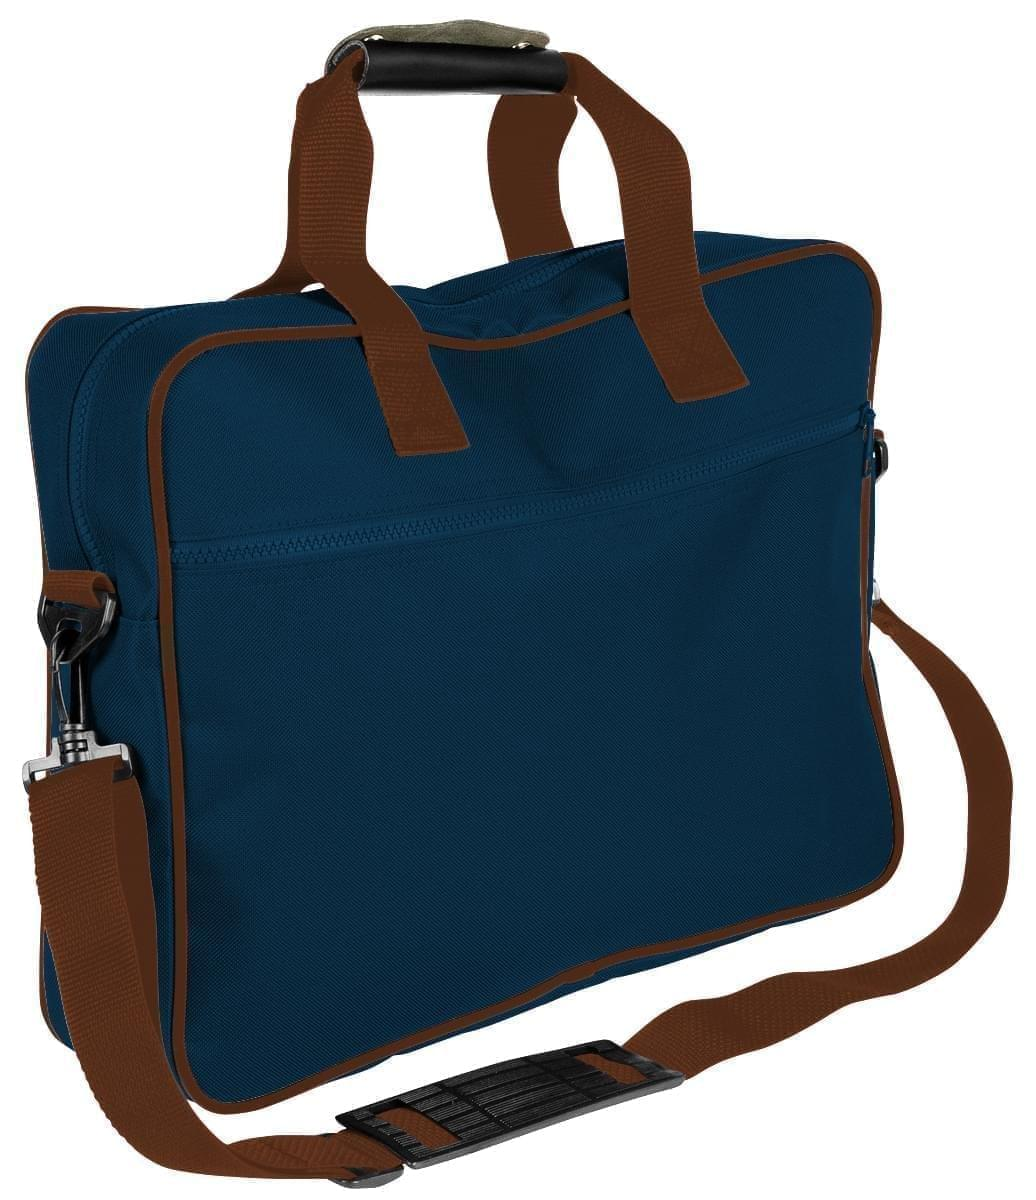 USA Made Nylon Poly Notebook Sleeves, Navy-Brown, CPKVA59PWS